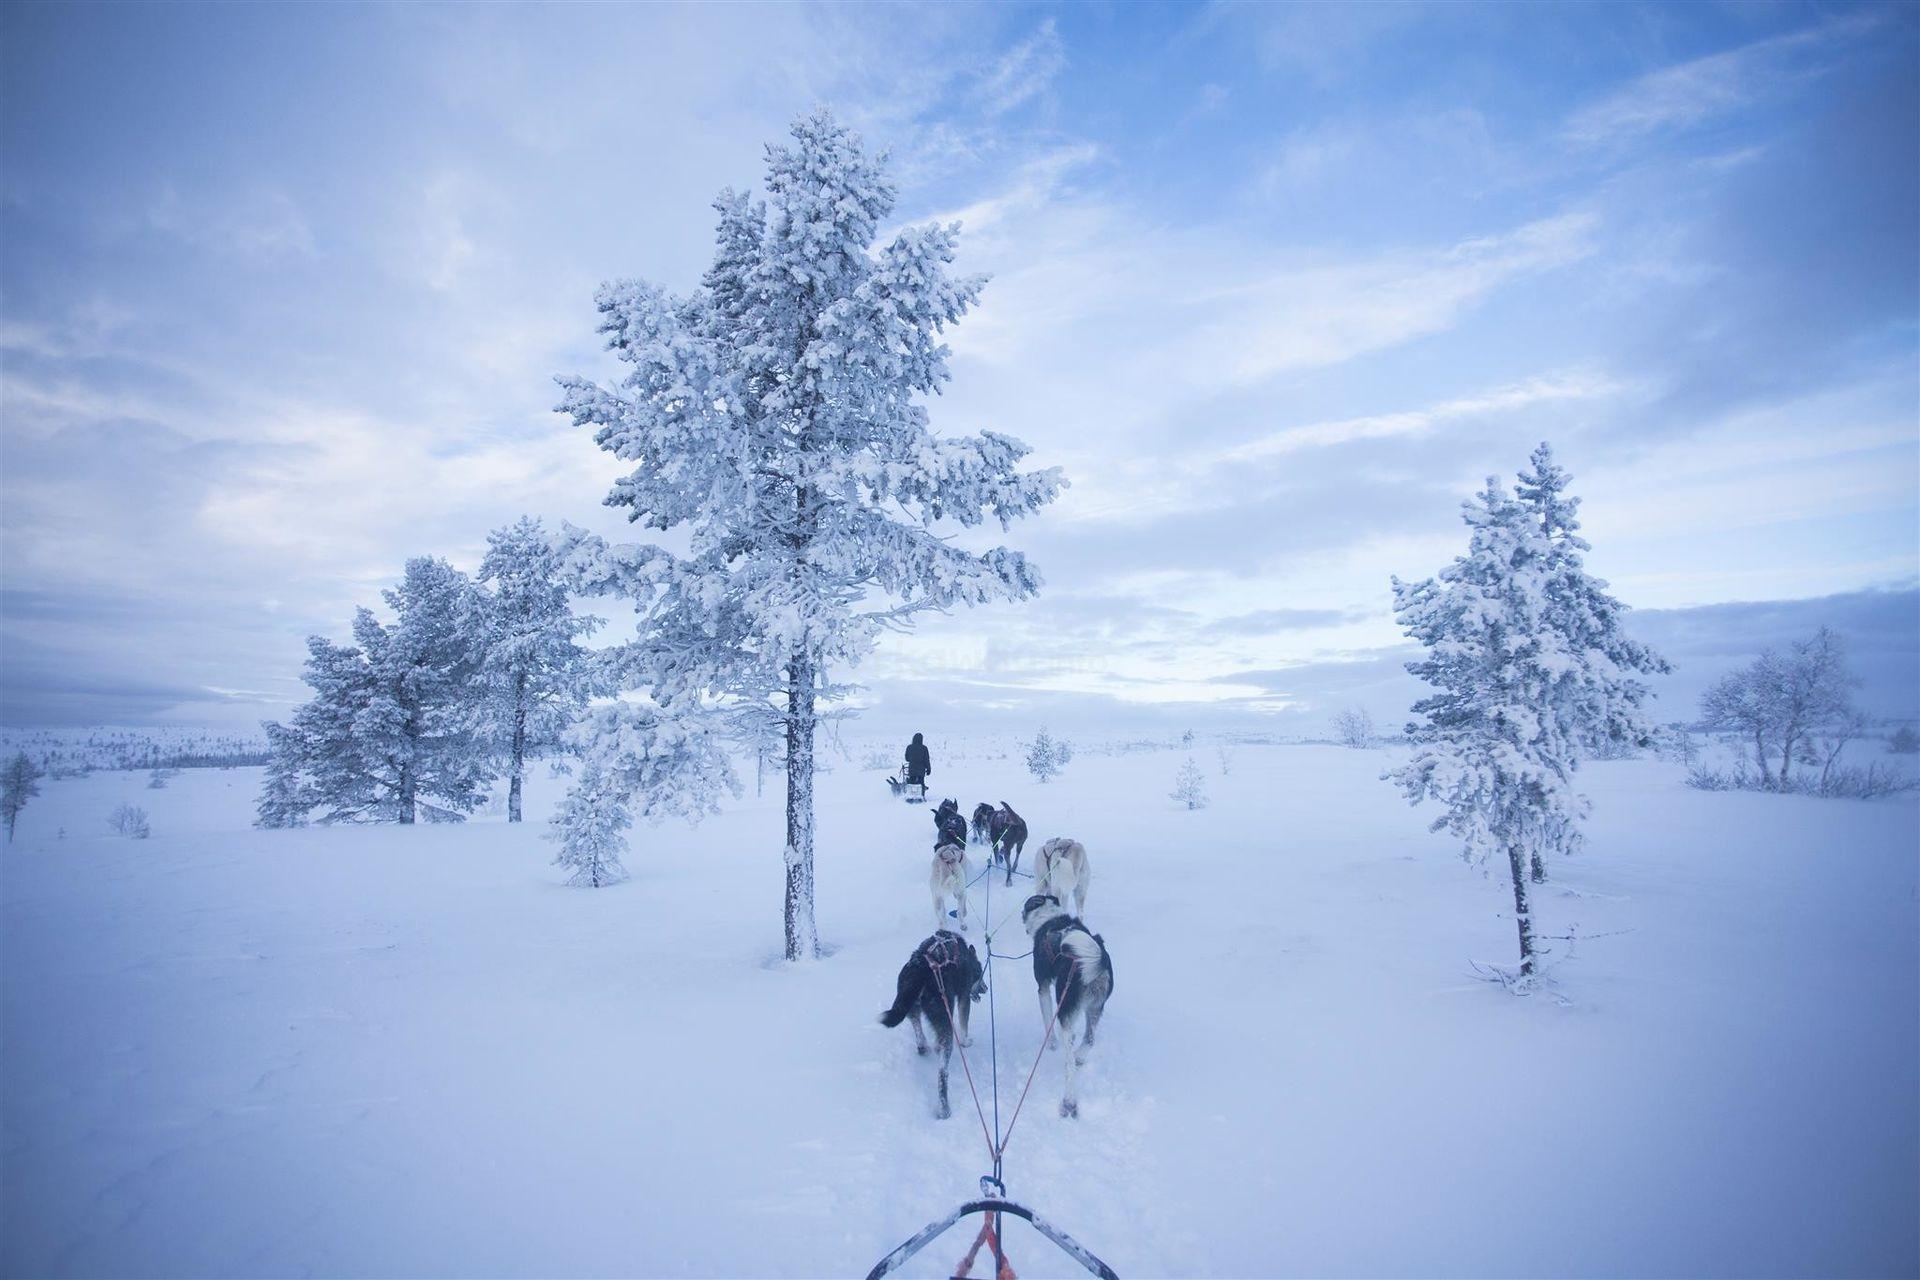 husky sledding across snow and trees